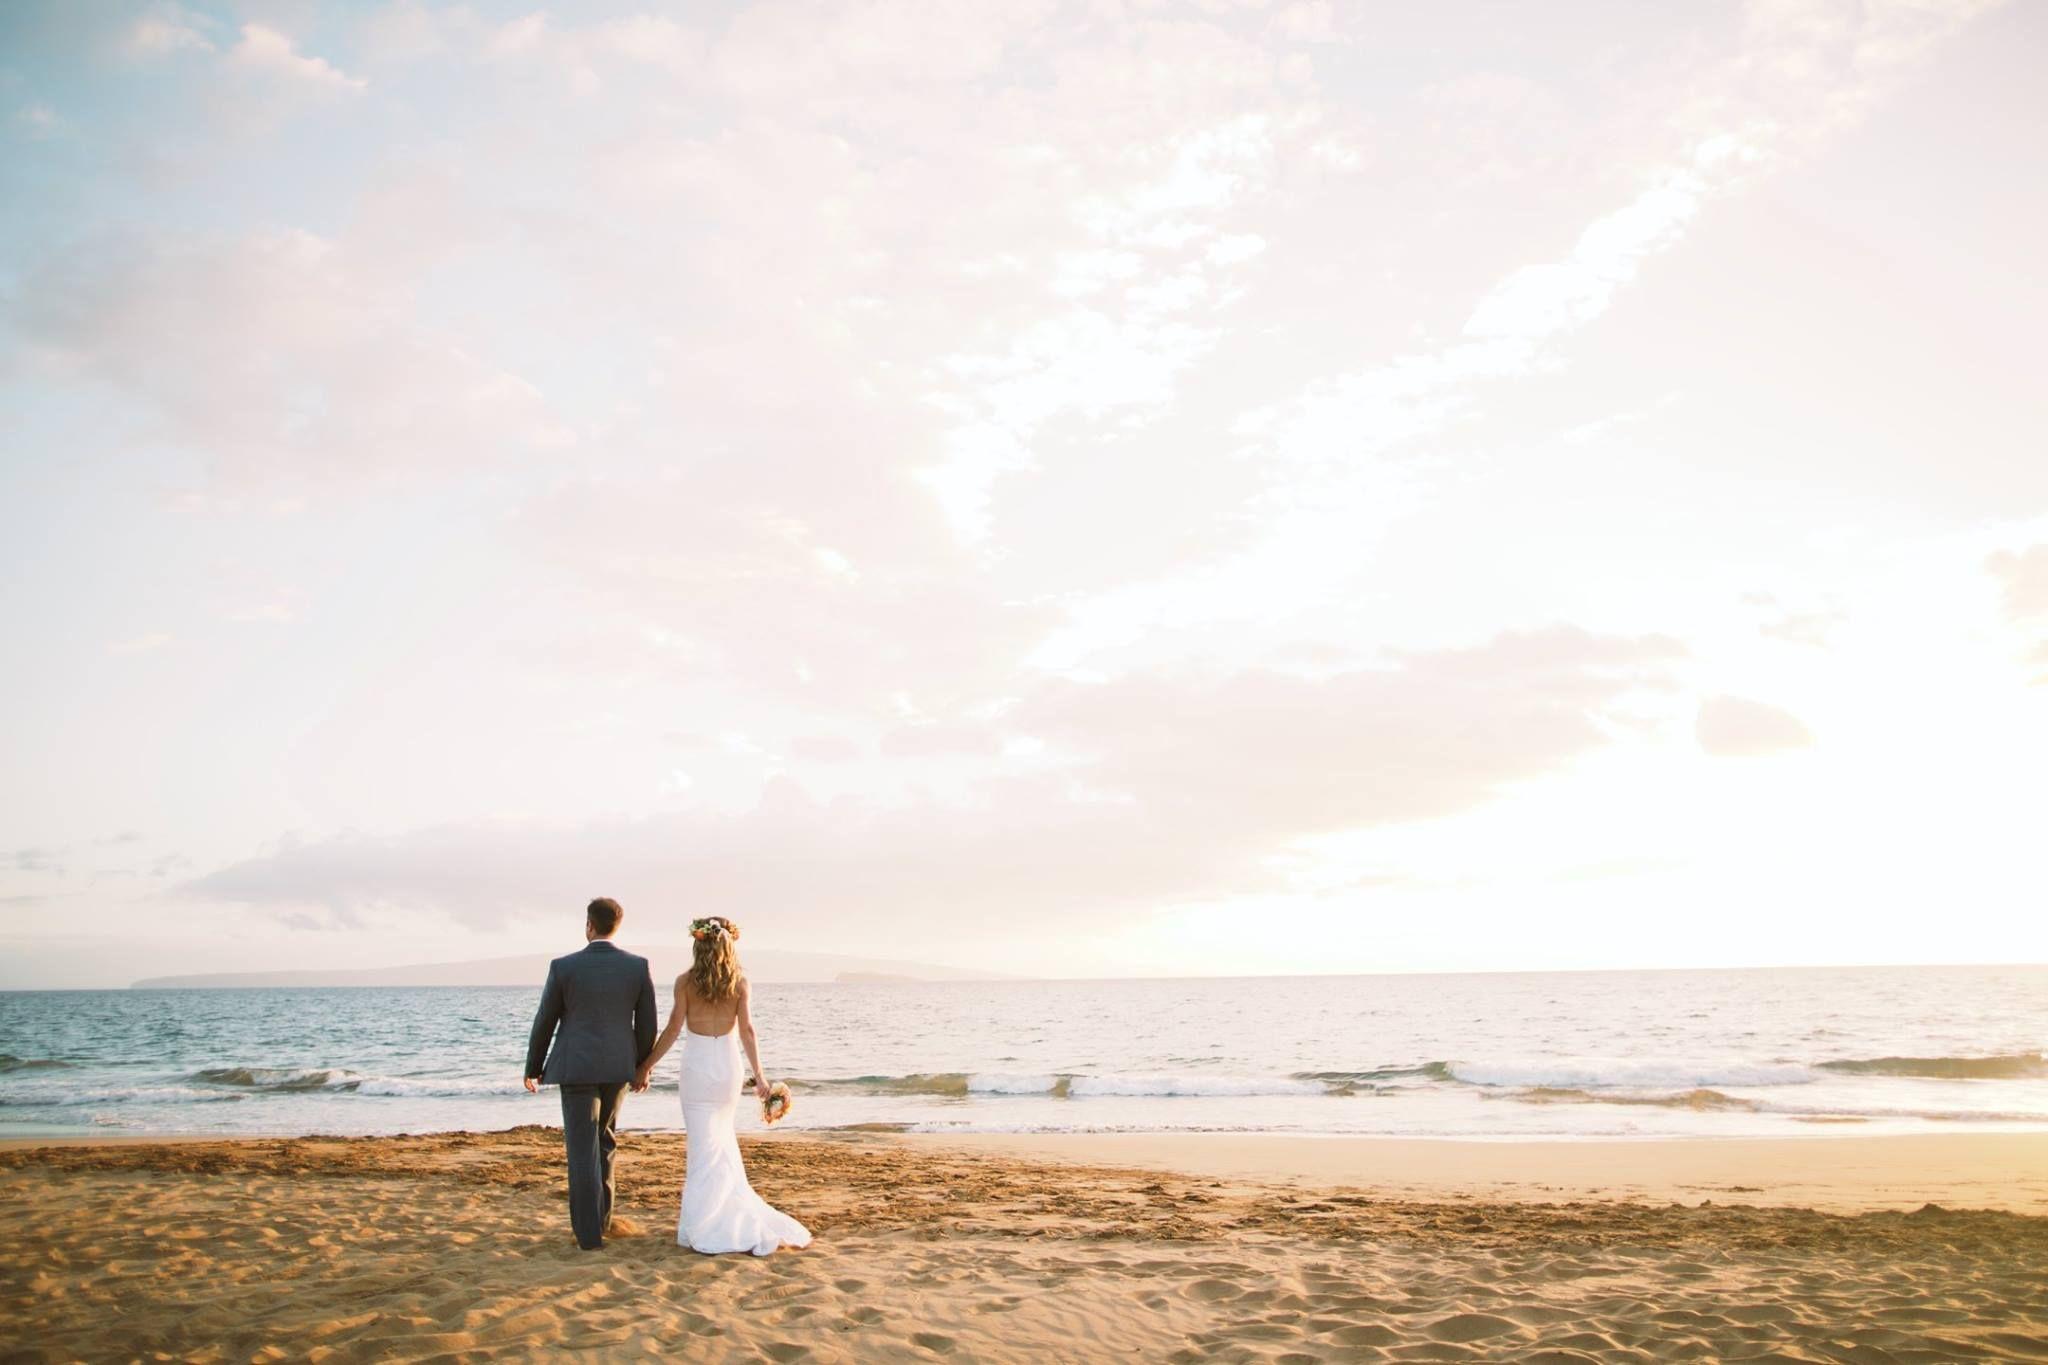 Beach Newlyweds - Anna Kim Photography